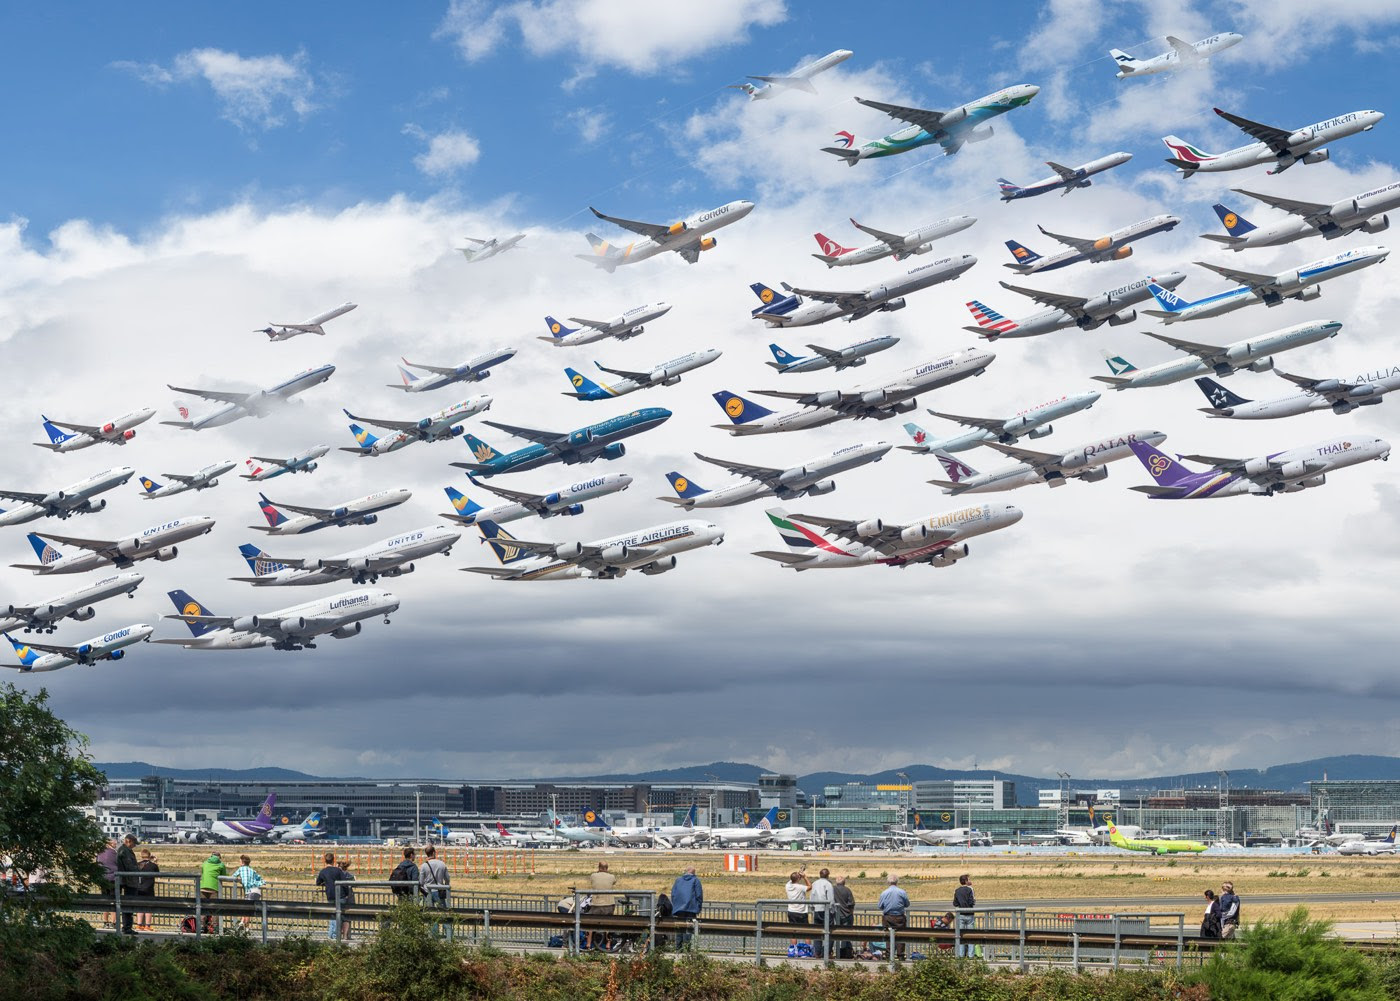 http://kottke.org/16/10/airportraits